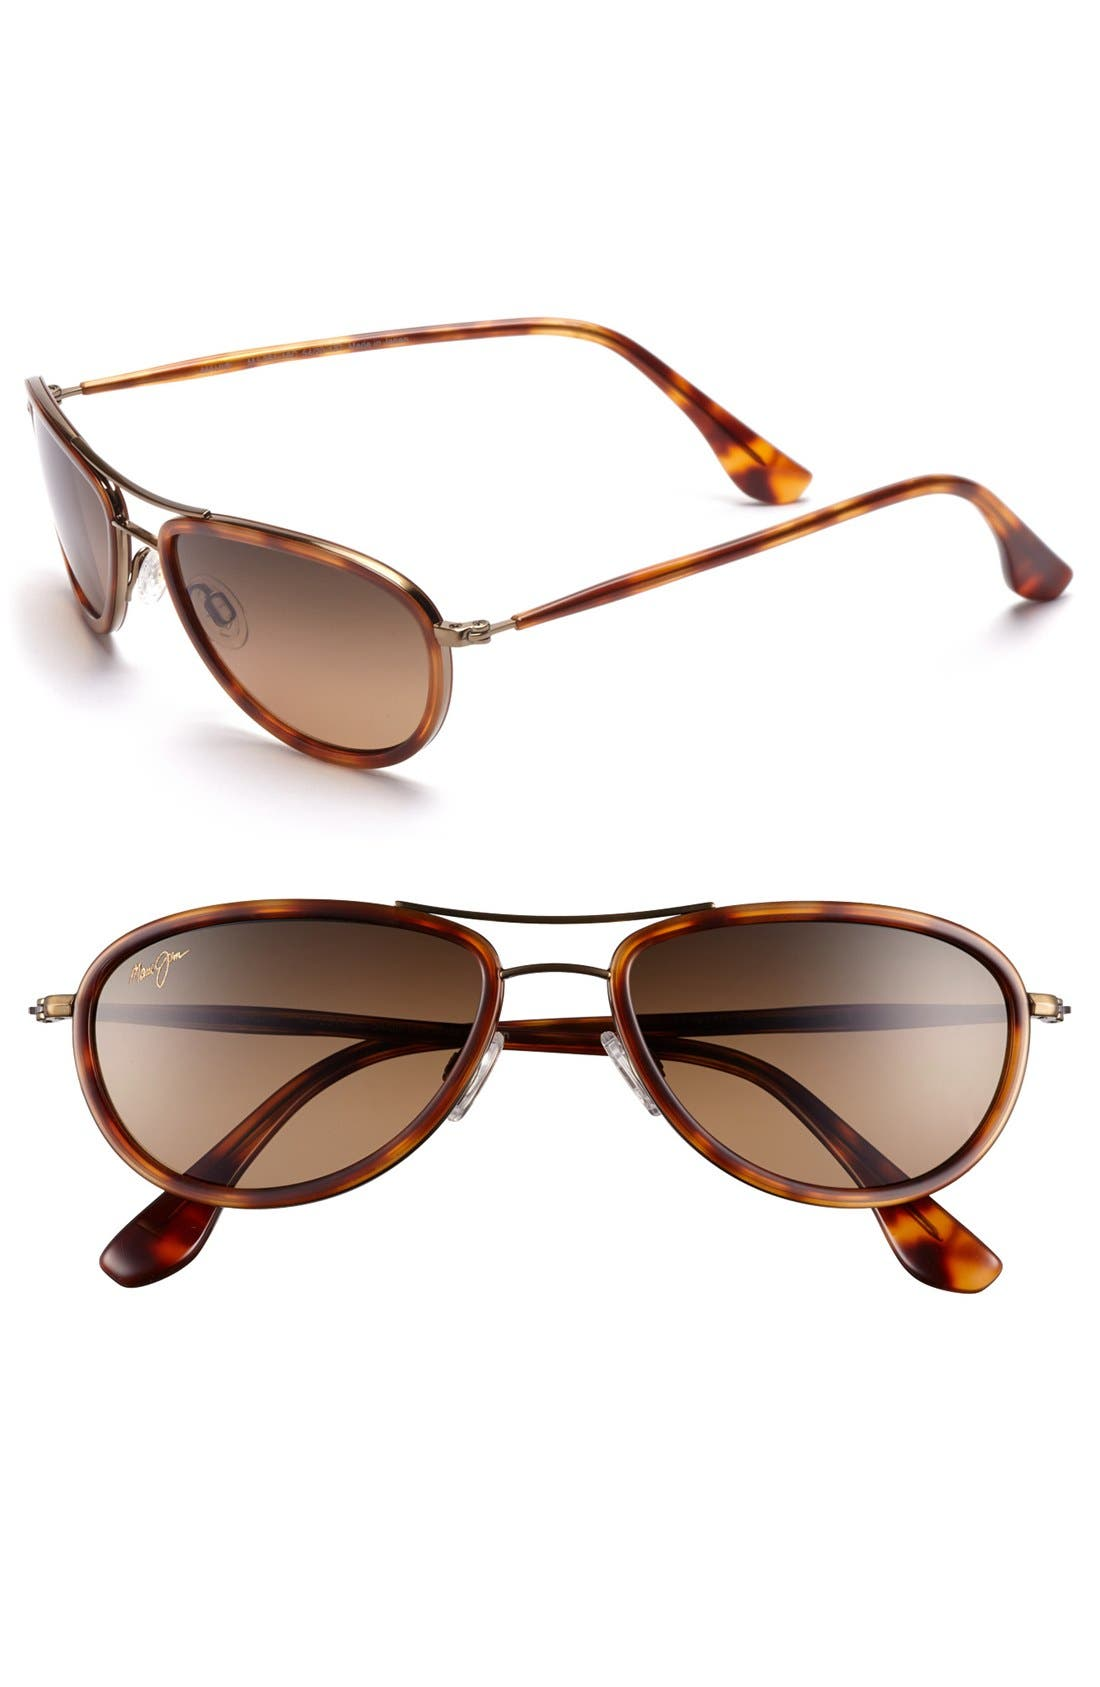 Main Image - Maui Jim 'Small - Kine' 54mm Sunglasses